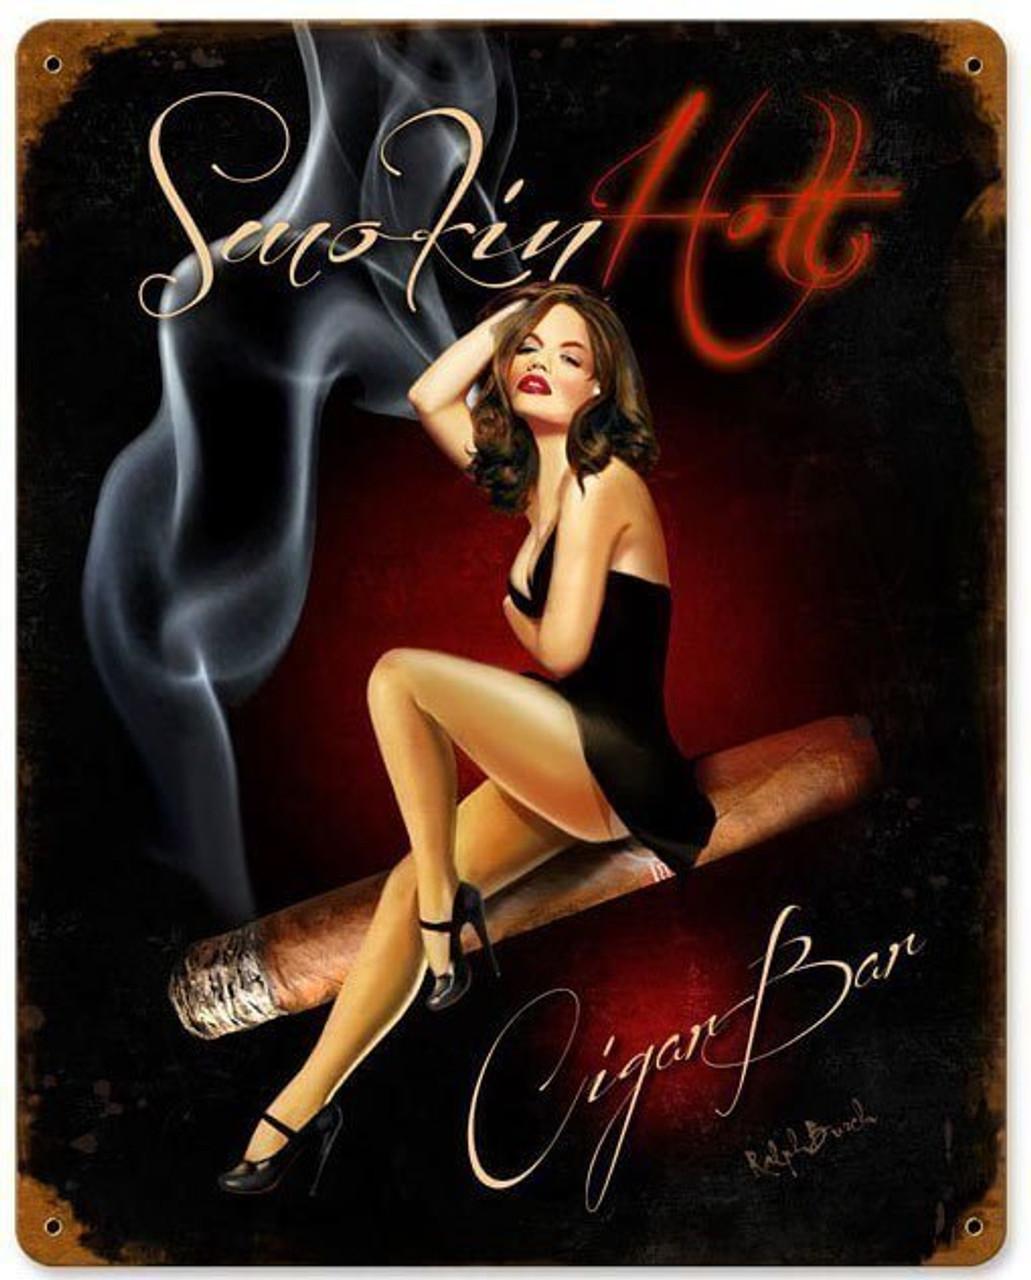 Cigar Bar Vintage Metal Sign 12 x 15 Inches